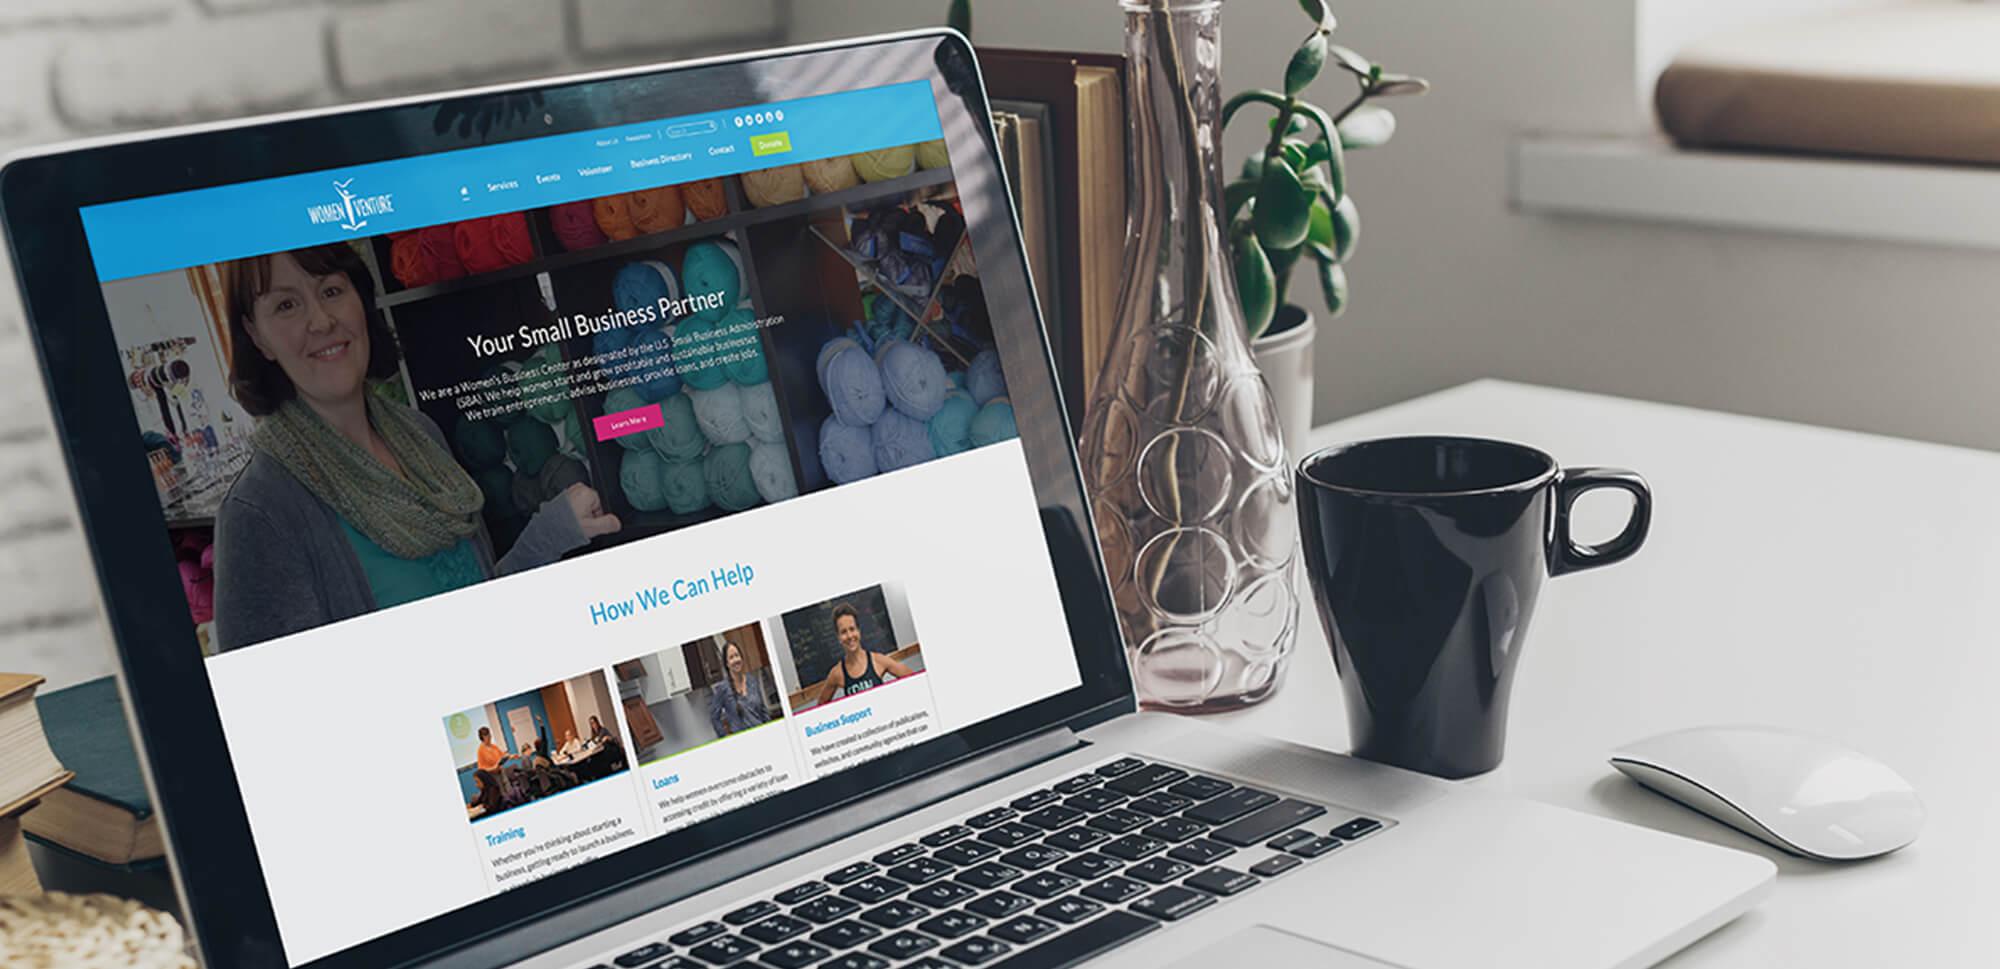 Laptop featuring WomenVenture's website